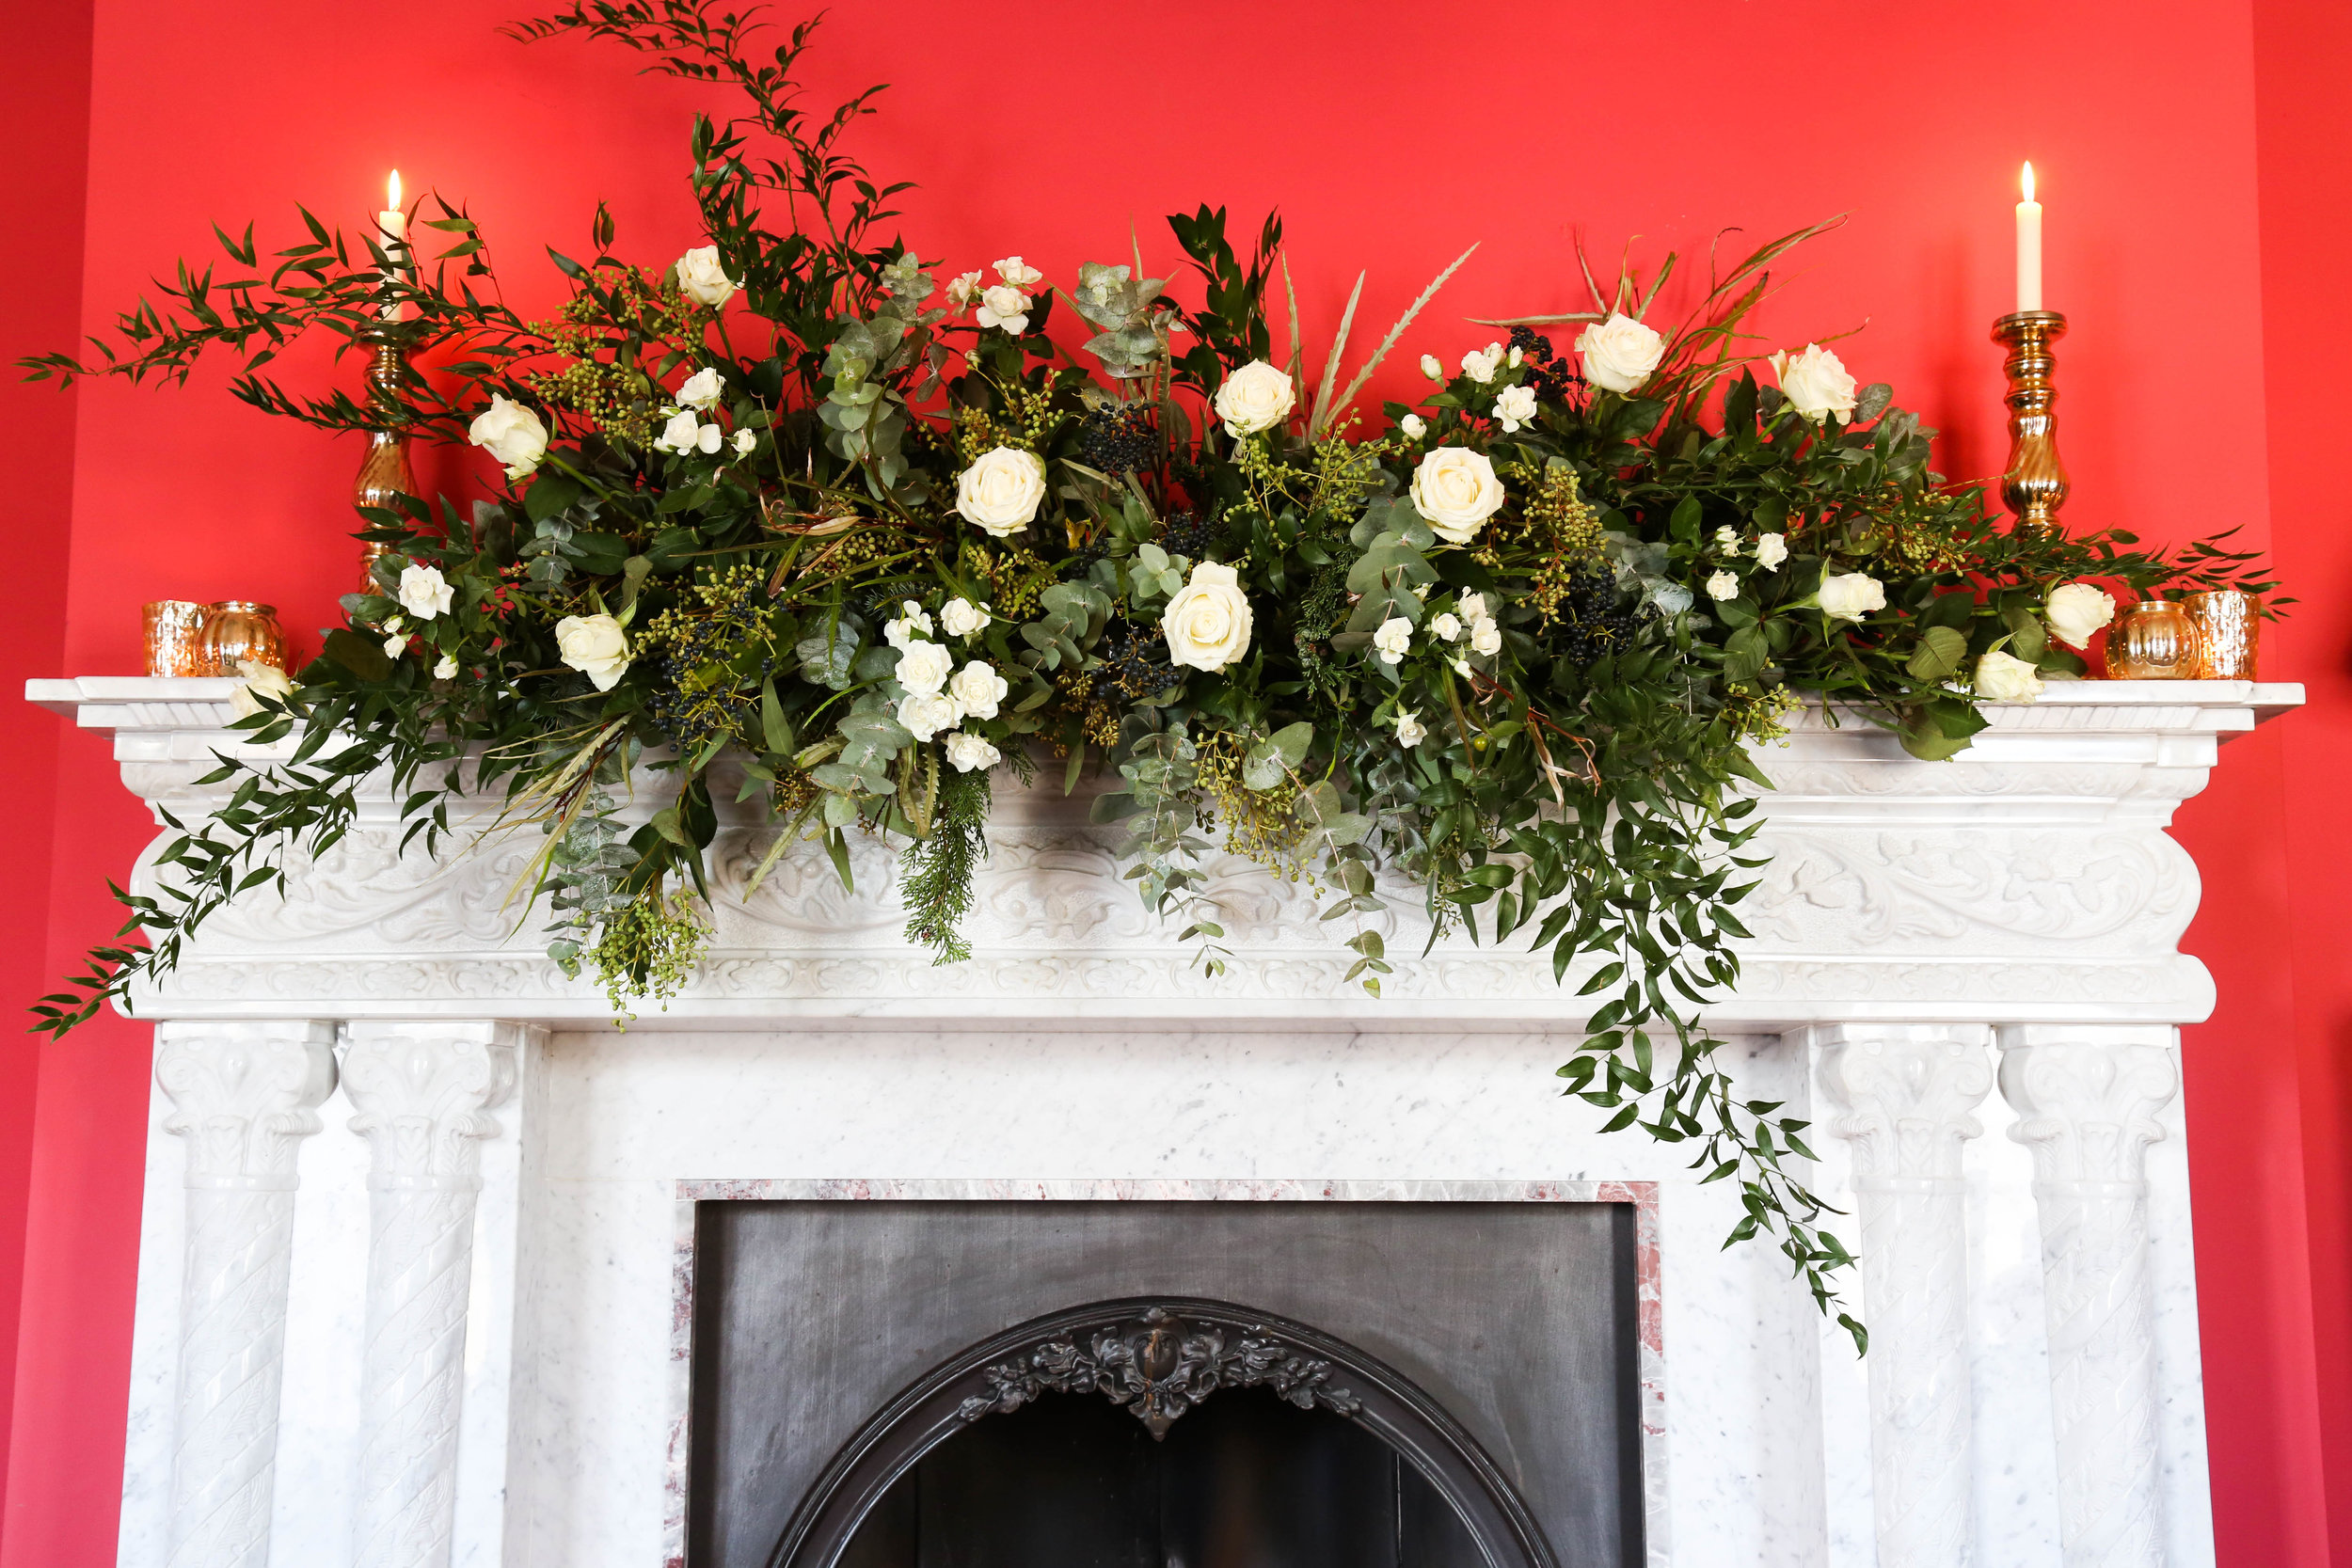 Festive fireplace garland